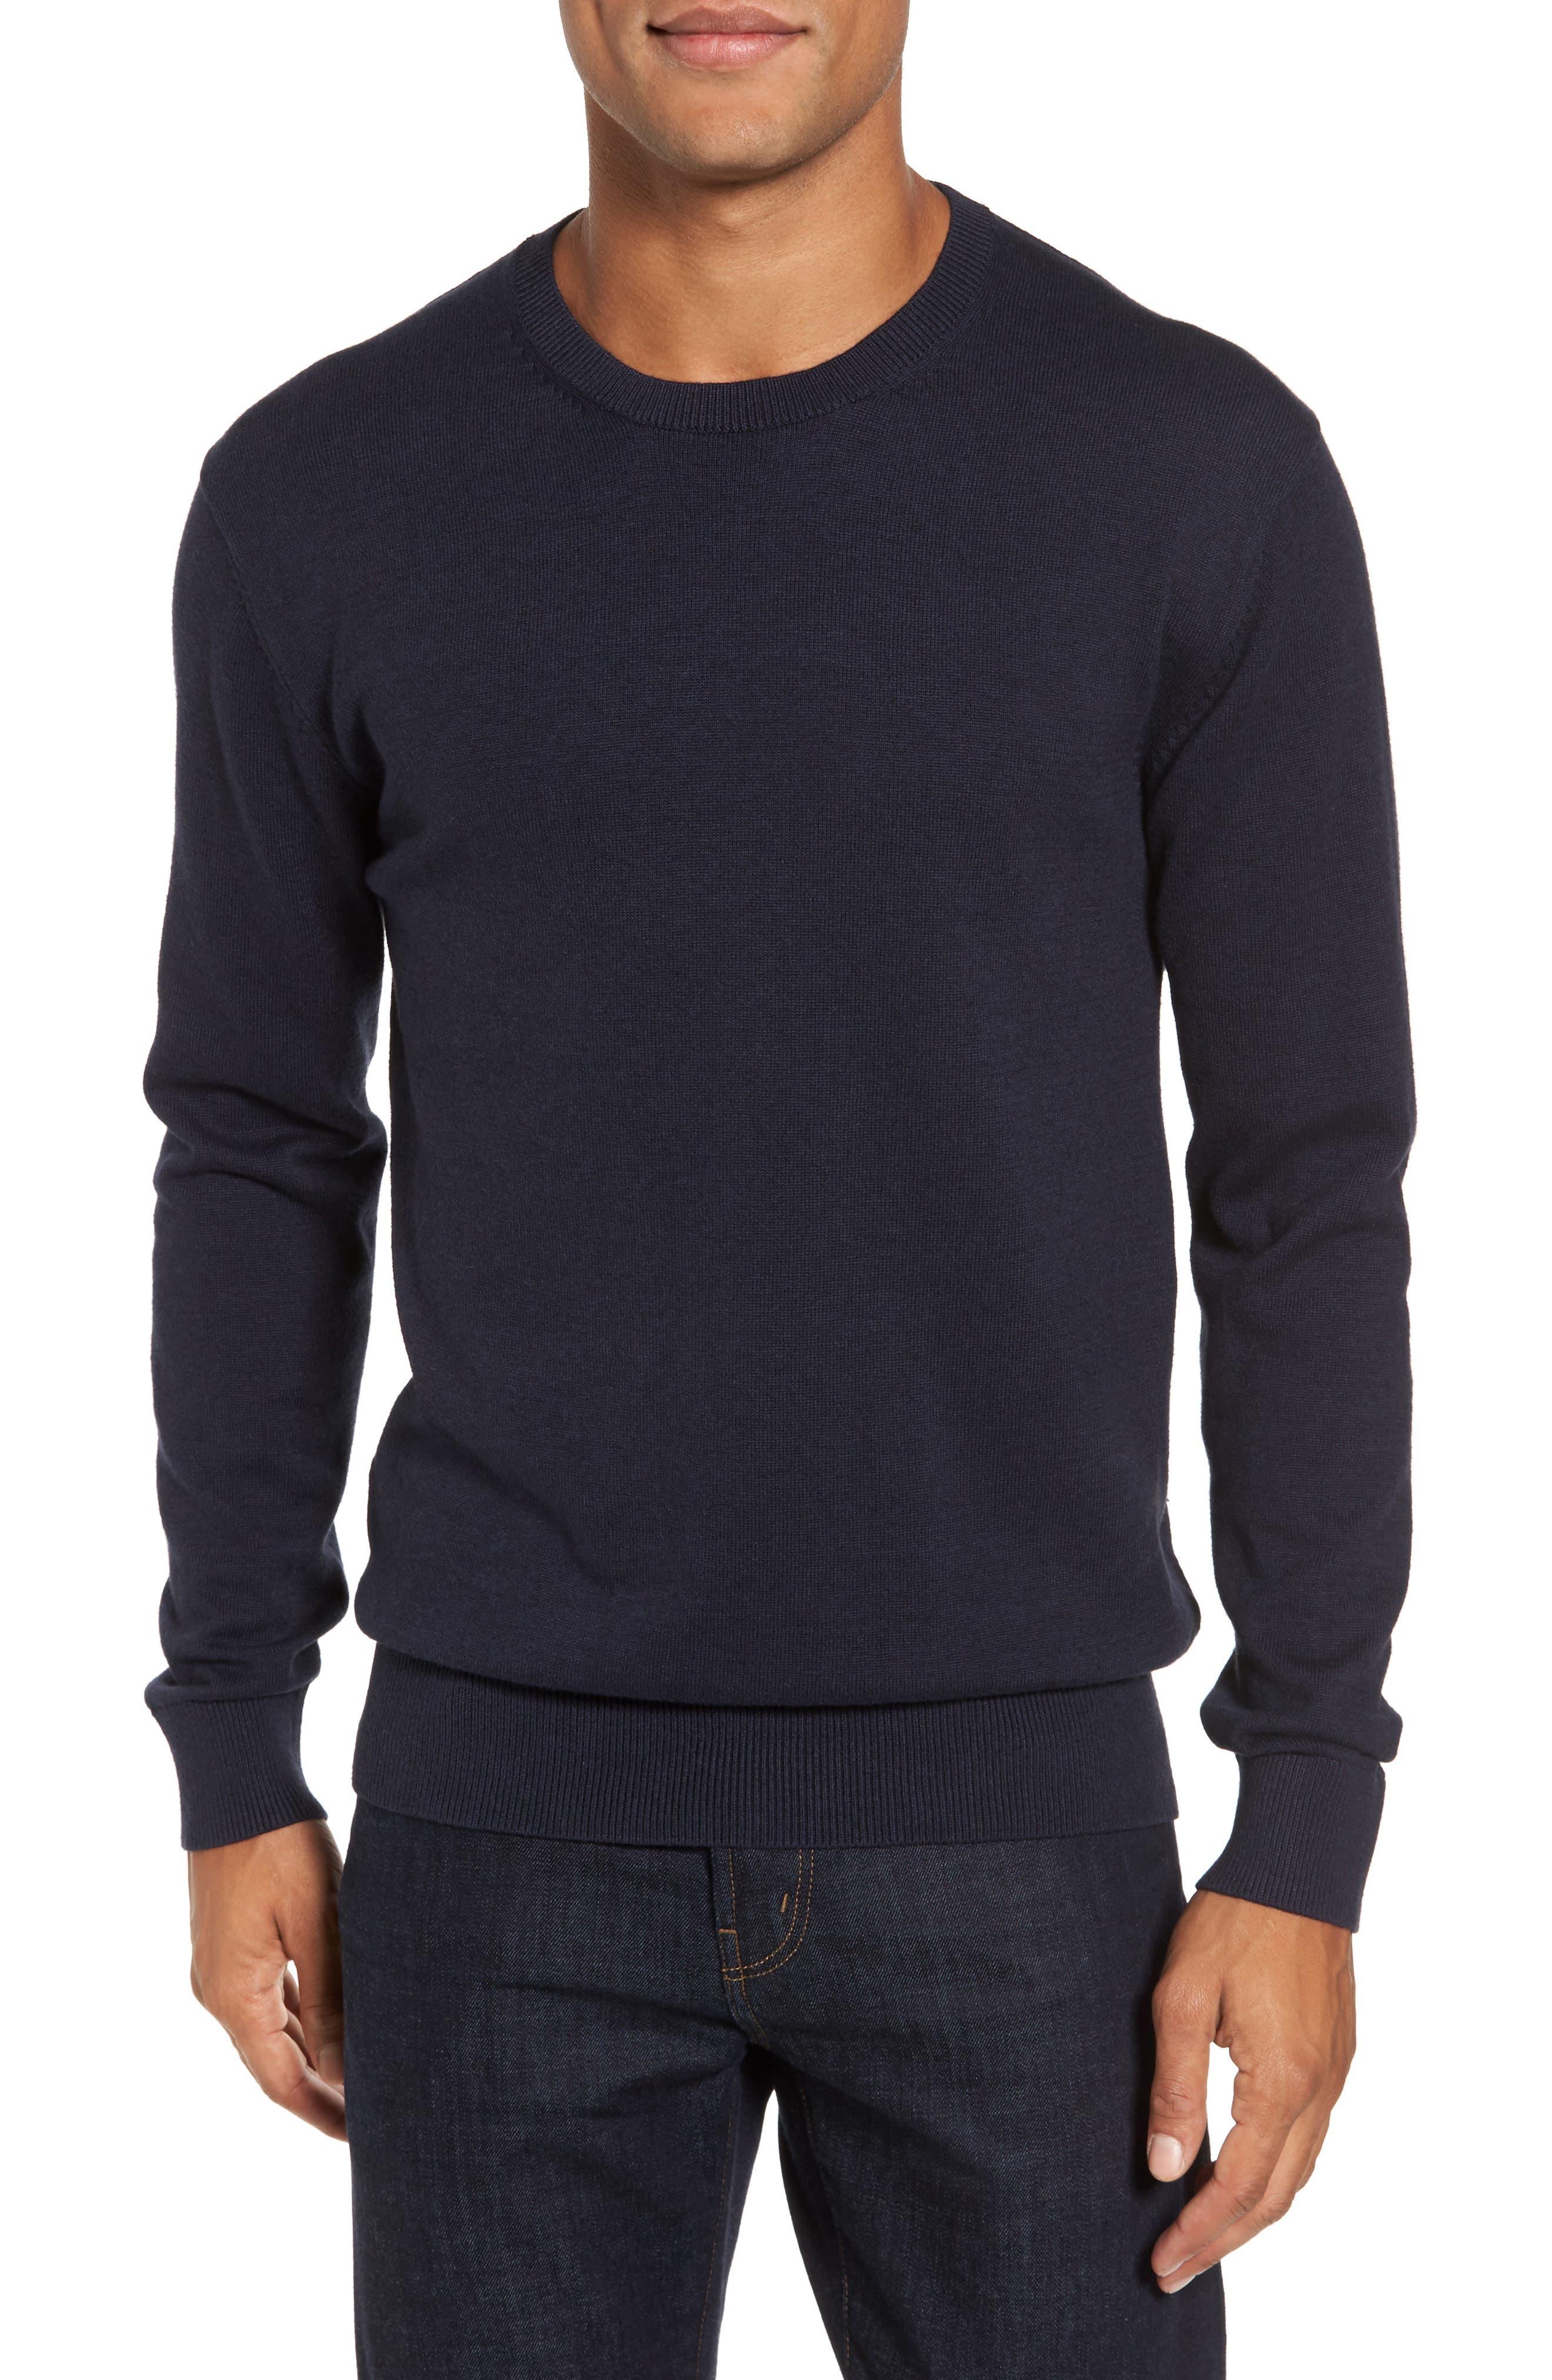 Portrait Crewneck Sweater,                         Main,                         color, Marine Blue